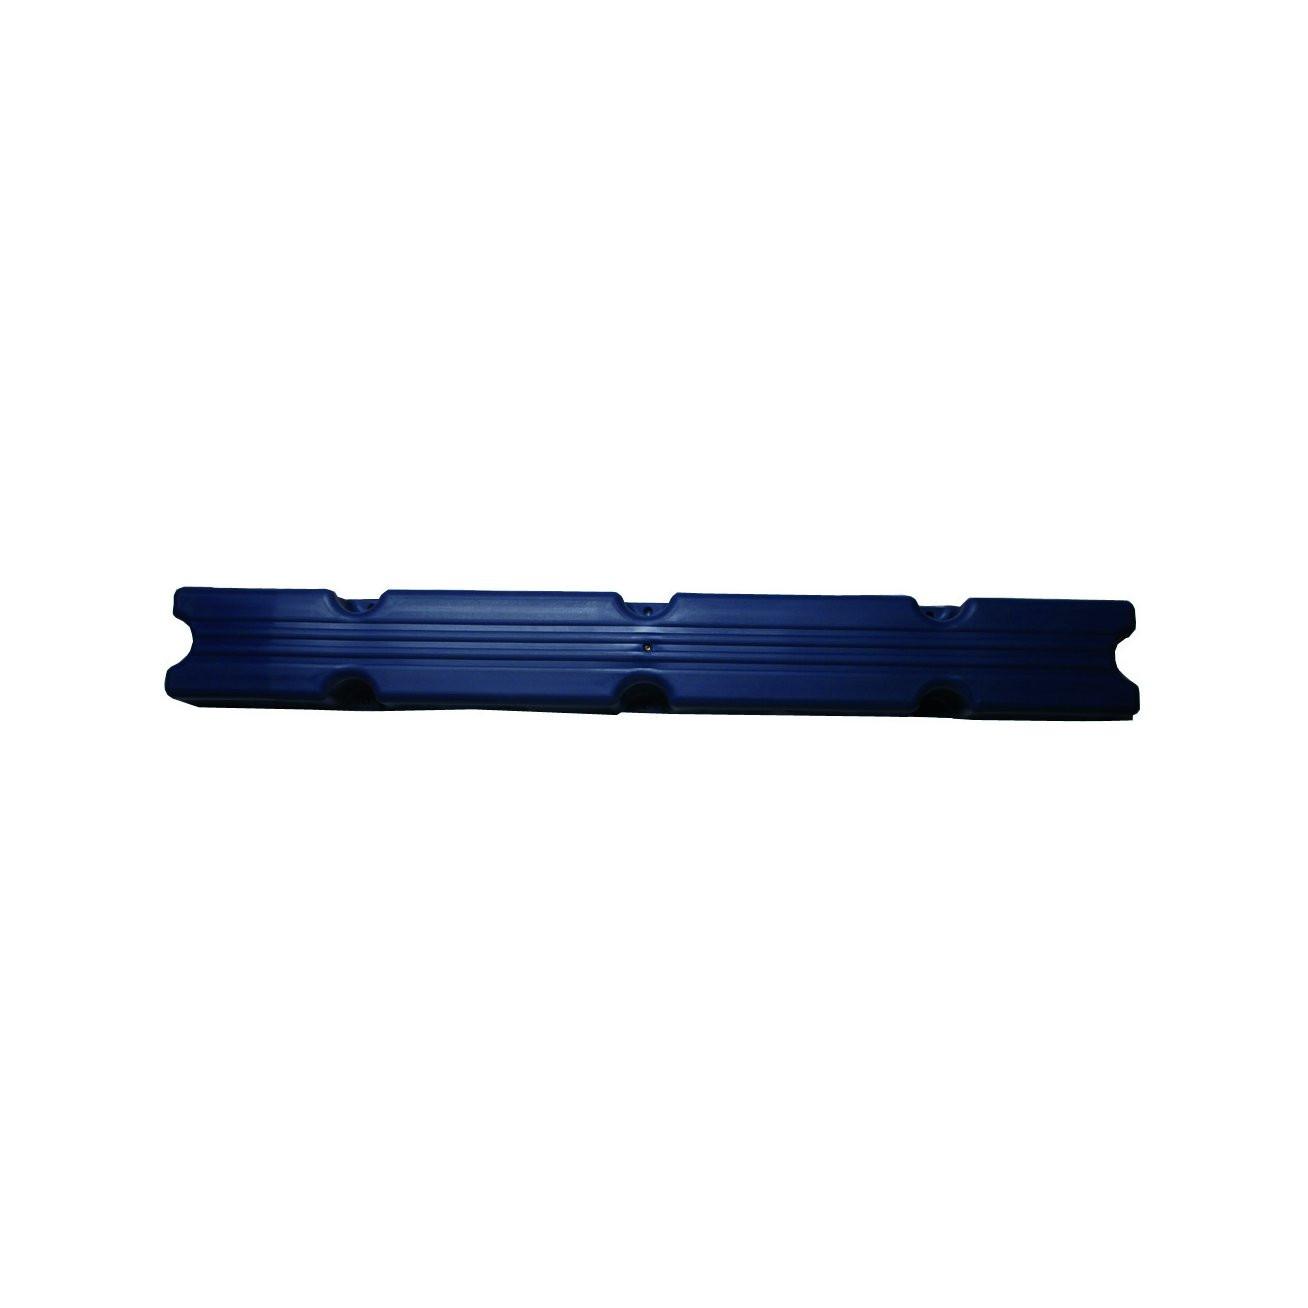 Pontonfender 100x12x7x7cm, marine